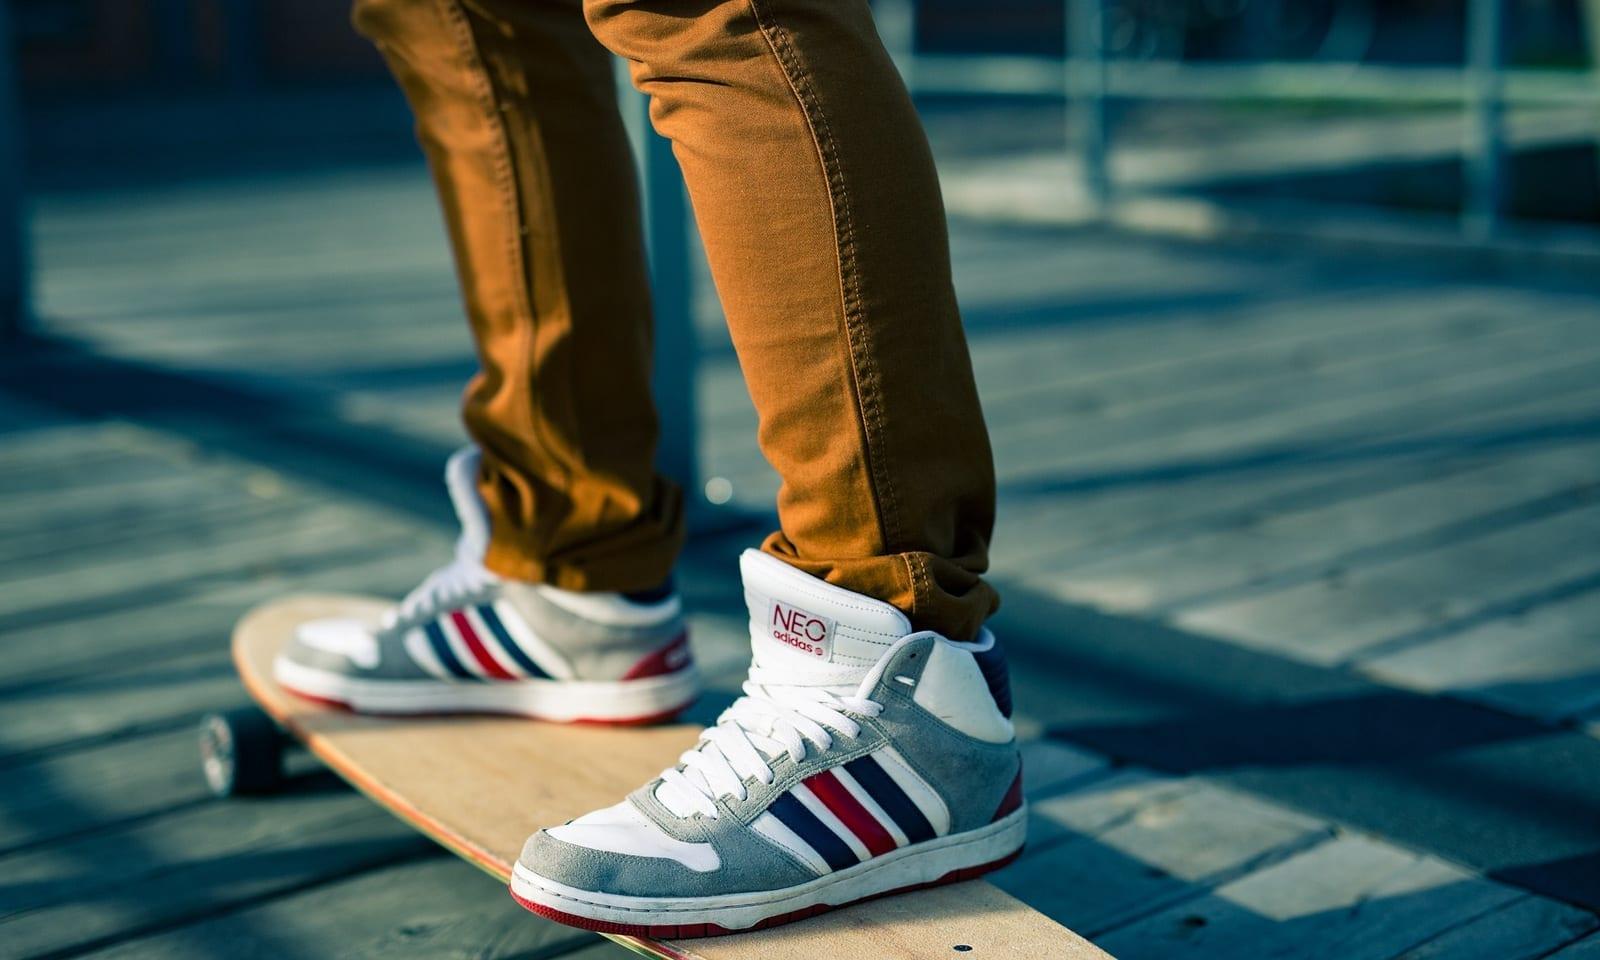 skate-shoes-image-4